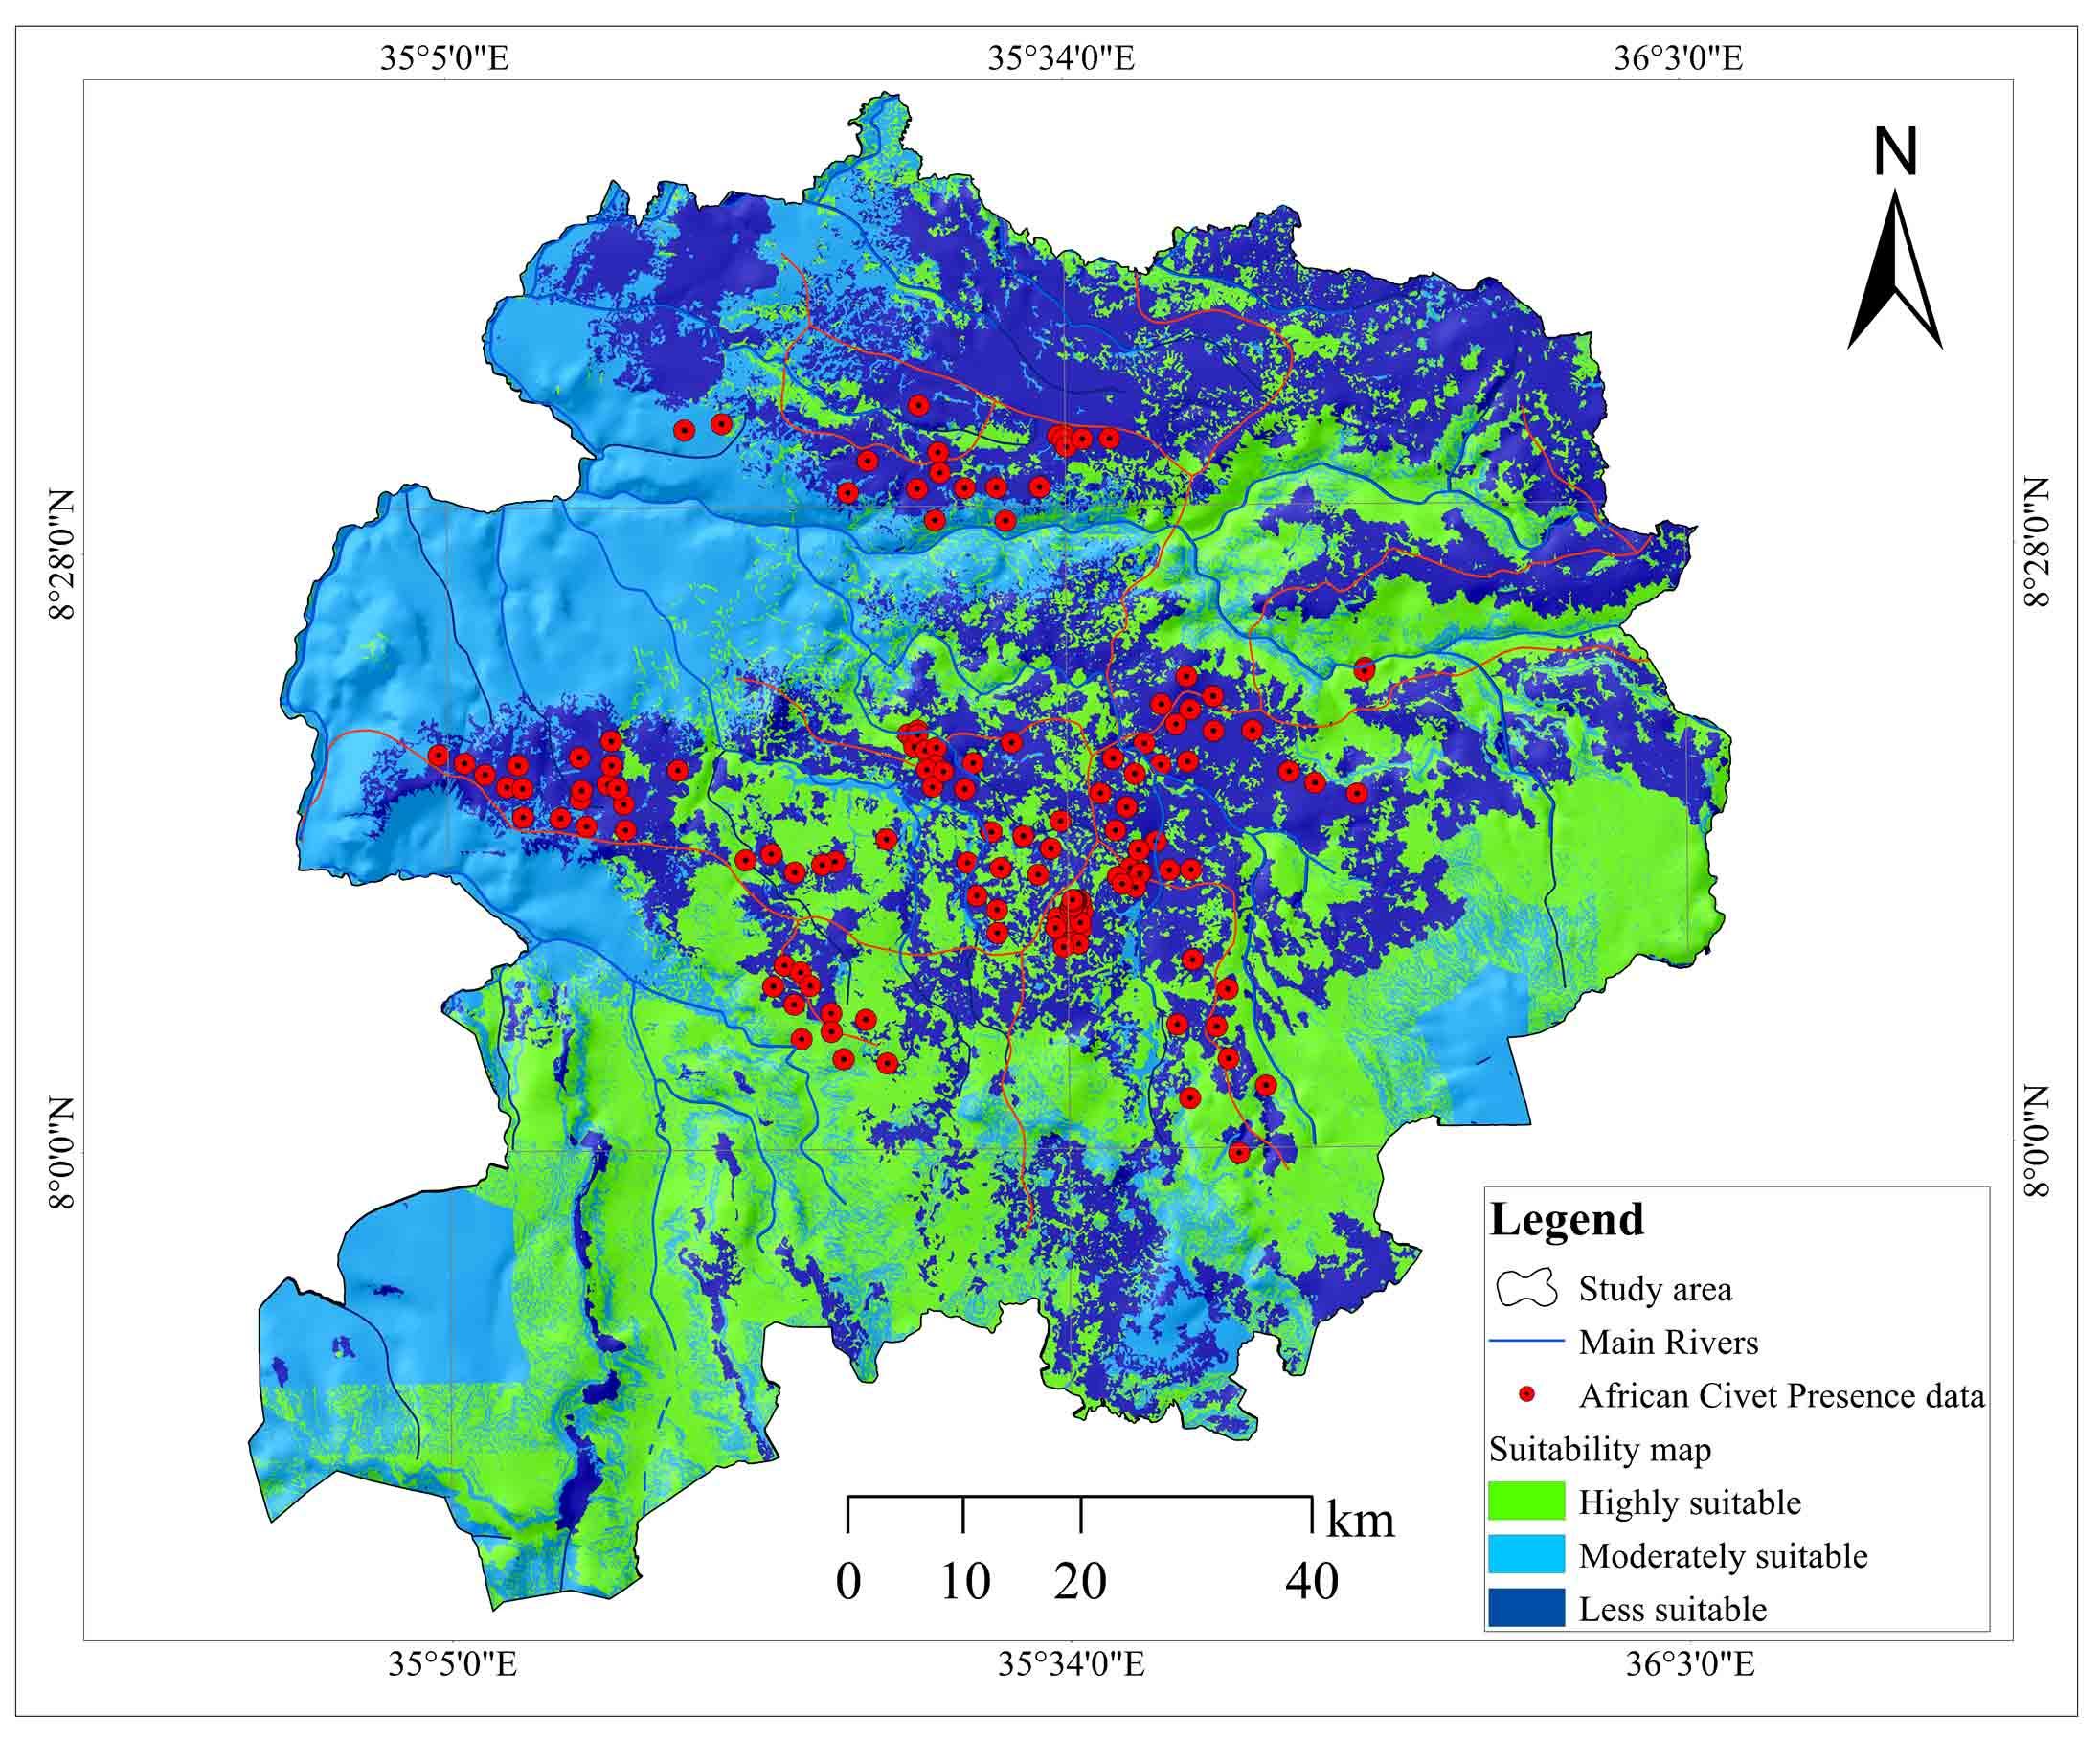 African Civet Habitat Mapping in Illu-Abbabora Zone, Southwest Ethiopia: Geospatial Approach